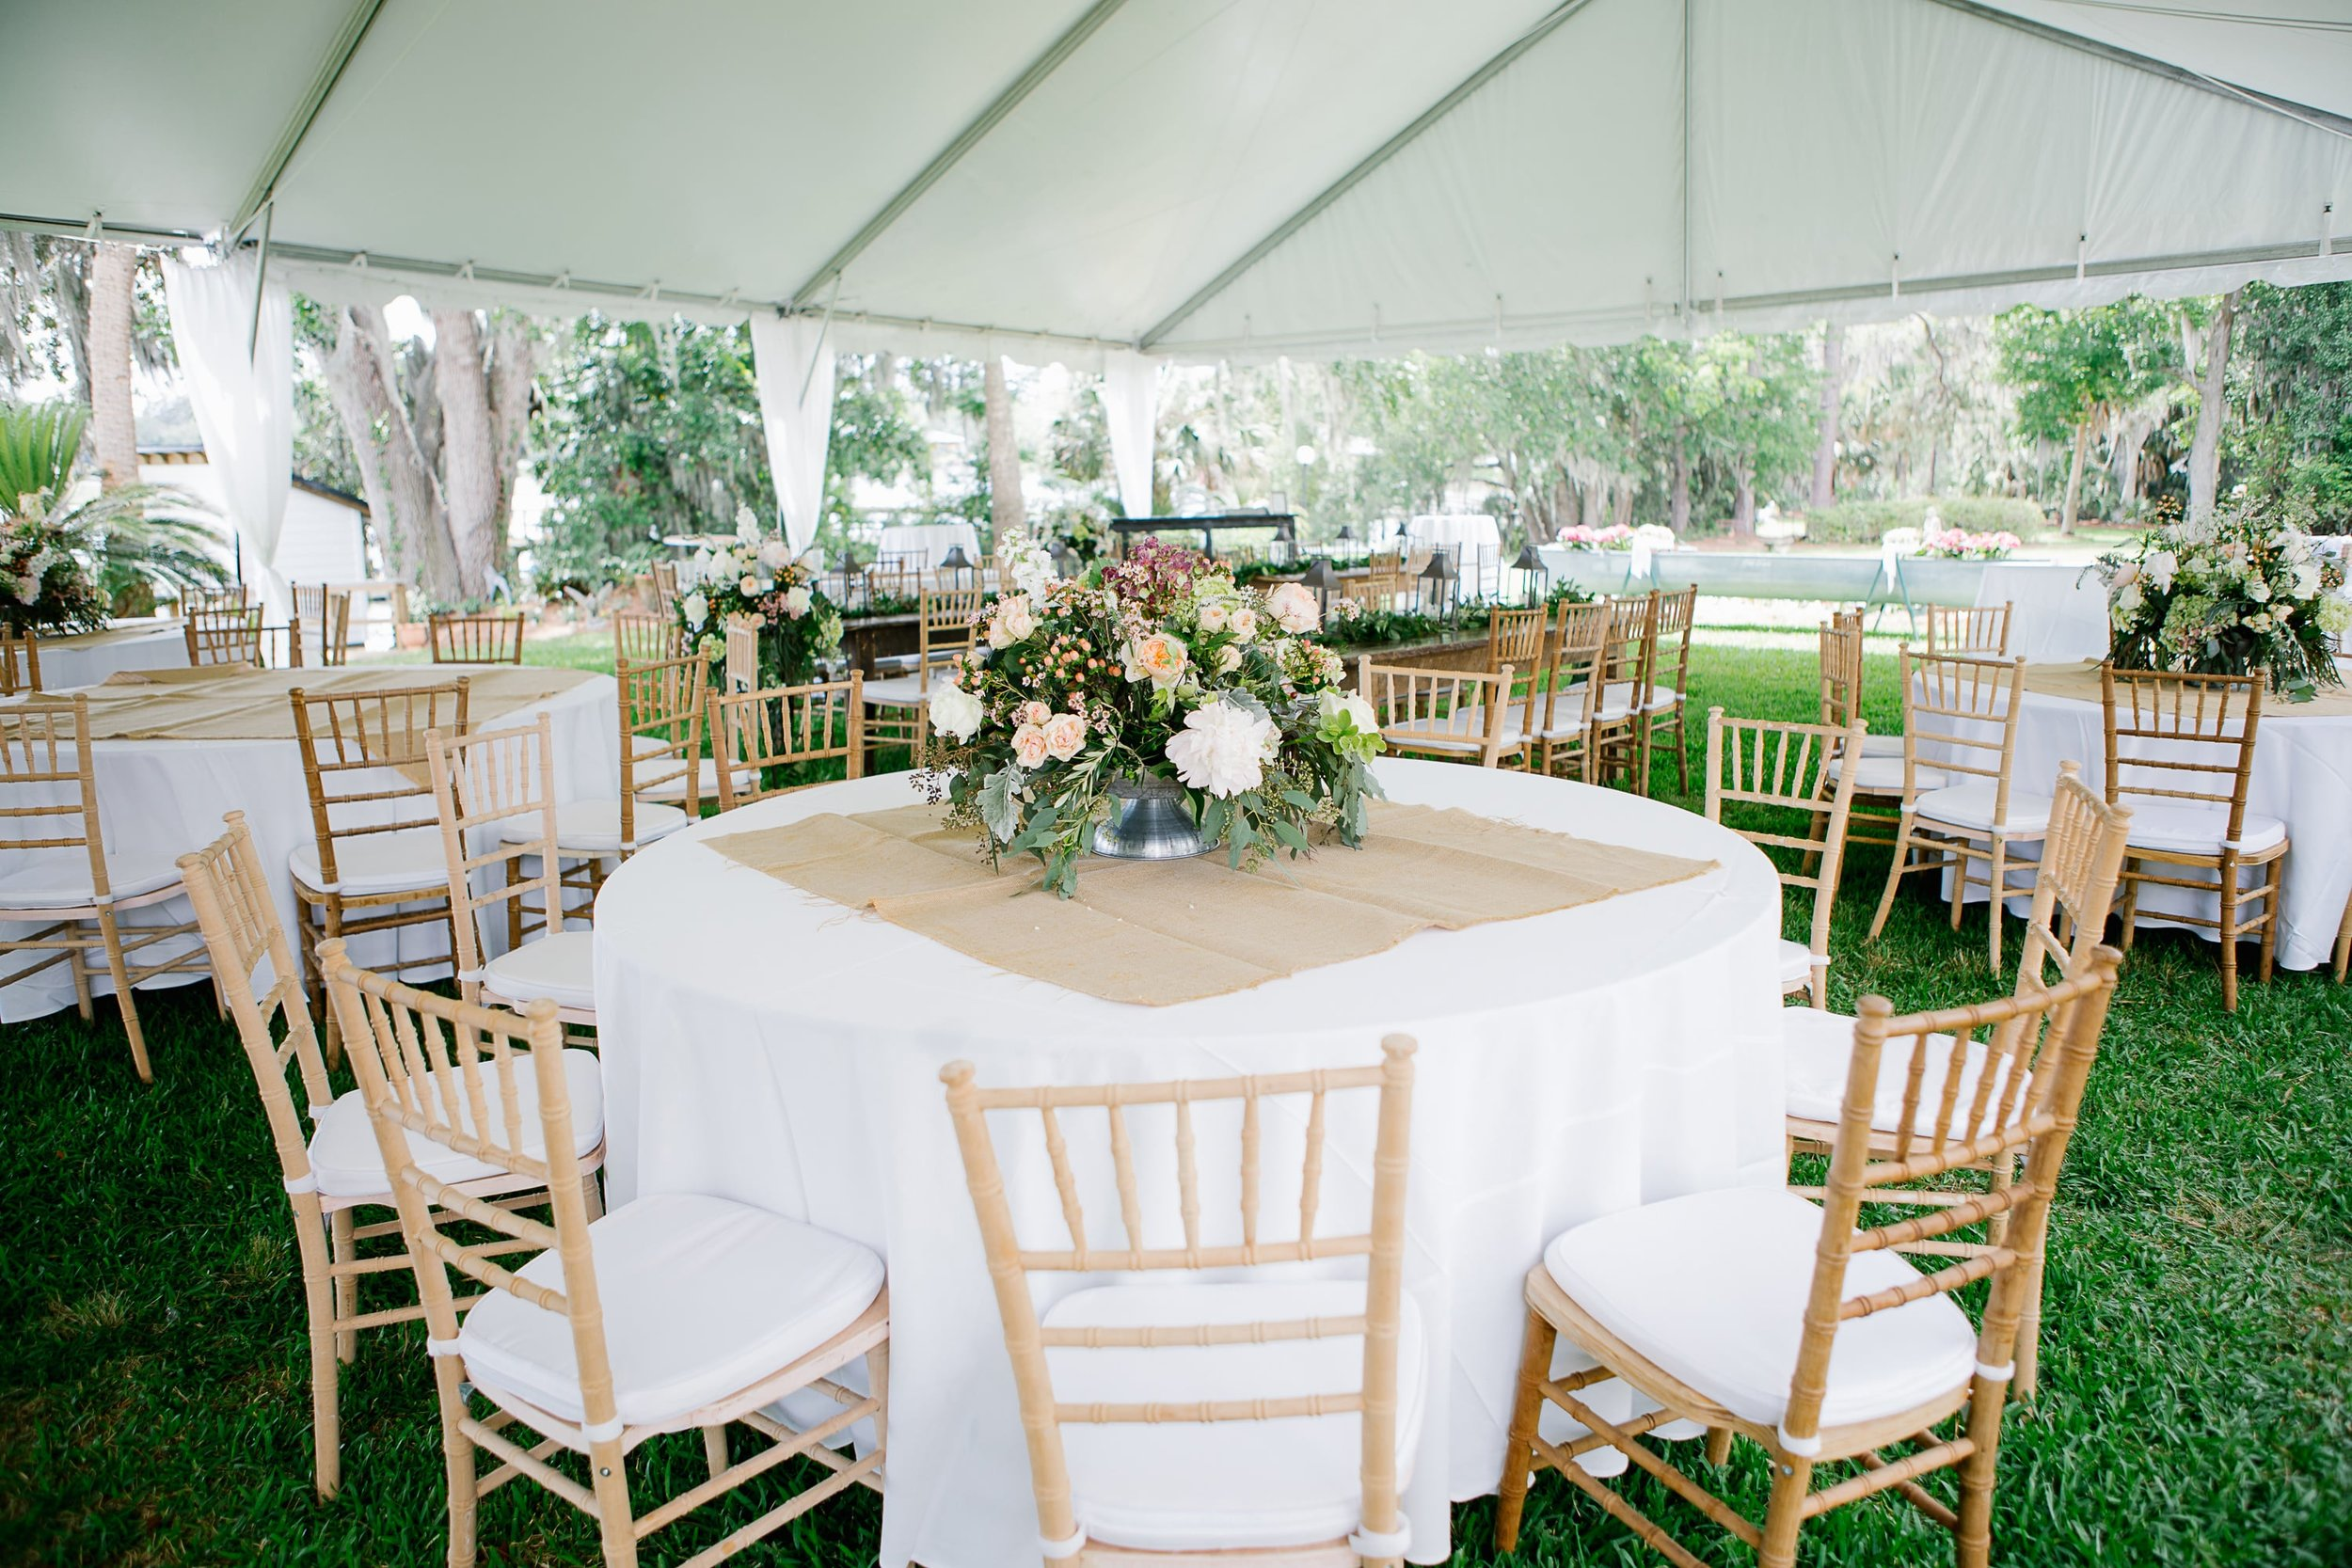 lowcountry-kitchen-catering-beaufort-sc-ben-and-margaret-gross-wedding-tent-min.jpg